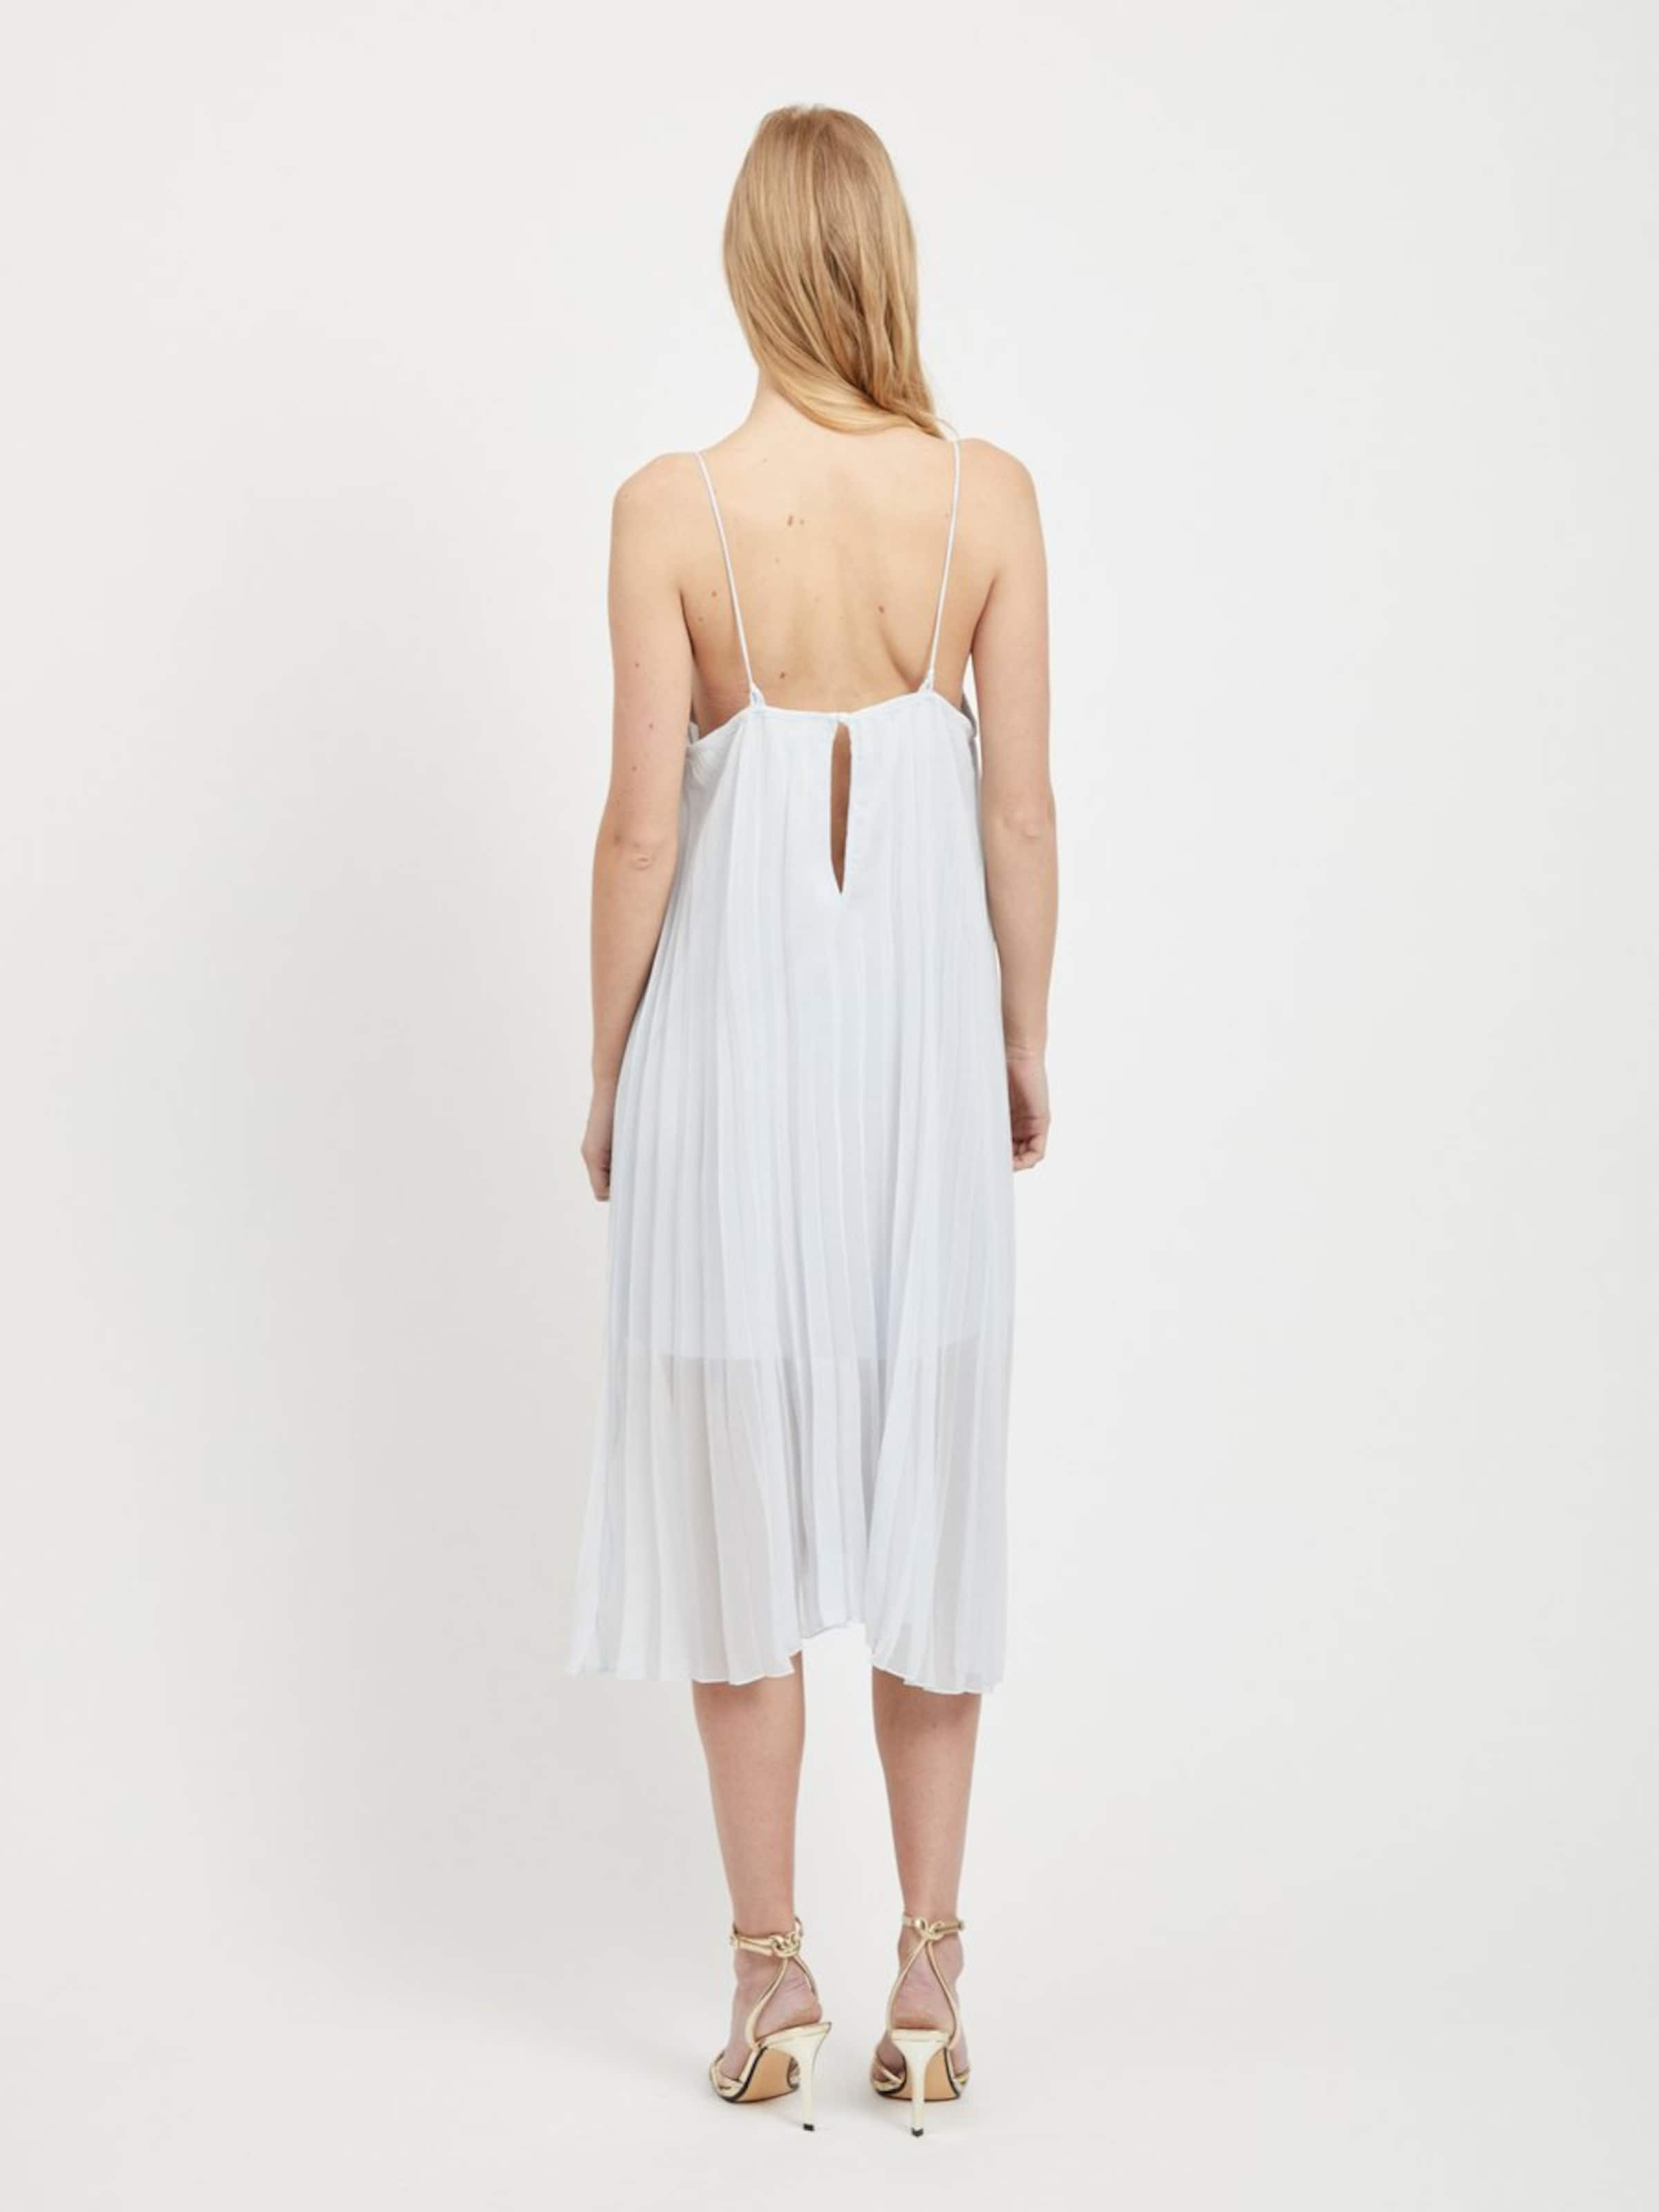 Vila Kleid In Kleid In Weiß Weiß In Weiß Vila Kleid Vila Vila Kleid JKc1lF